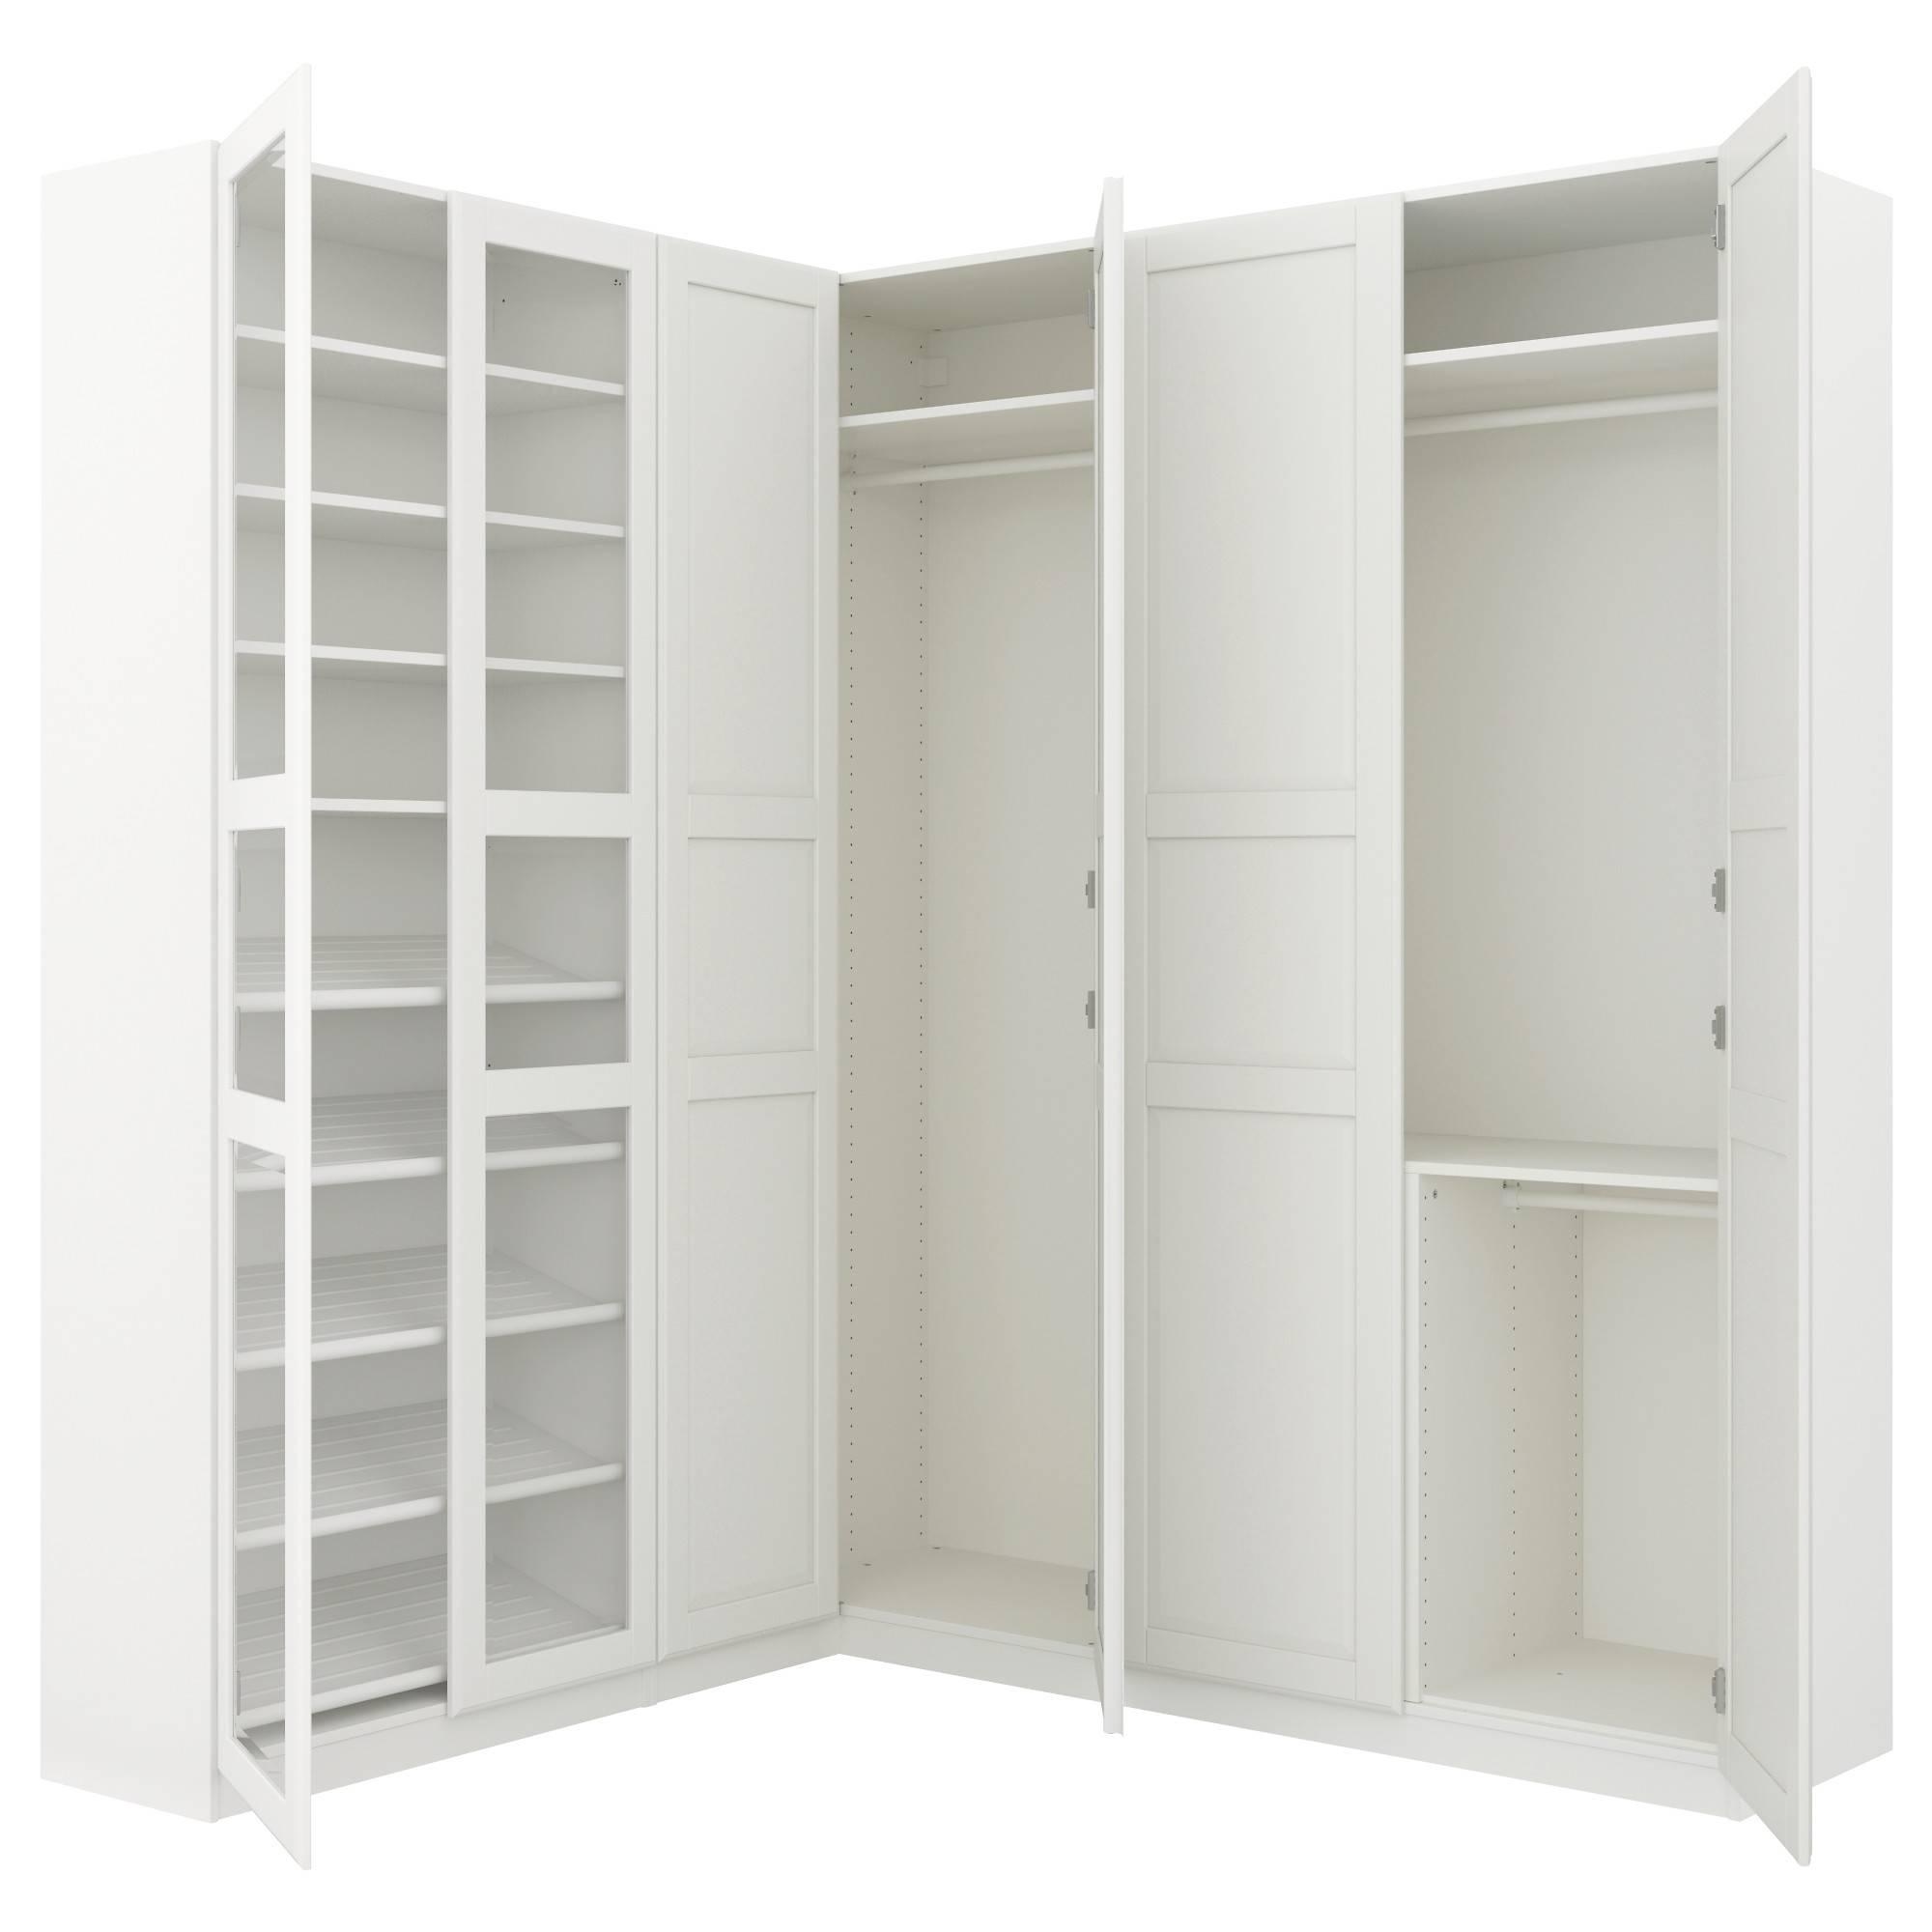 Corner Wardrobes intended for White Corner Wardrobes Units (Image 5 of 15)